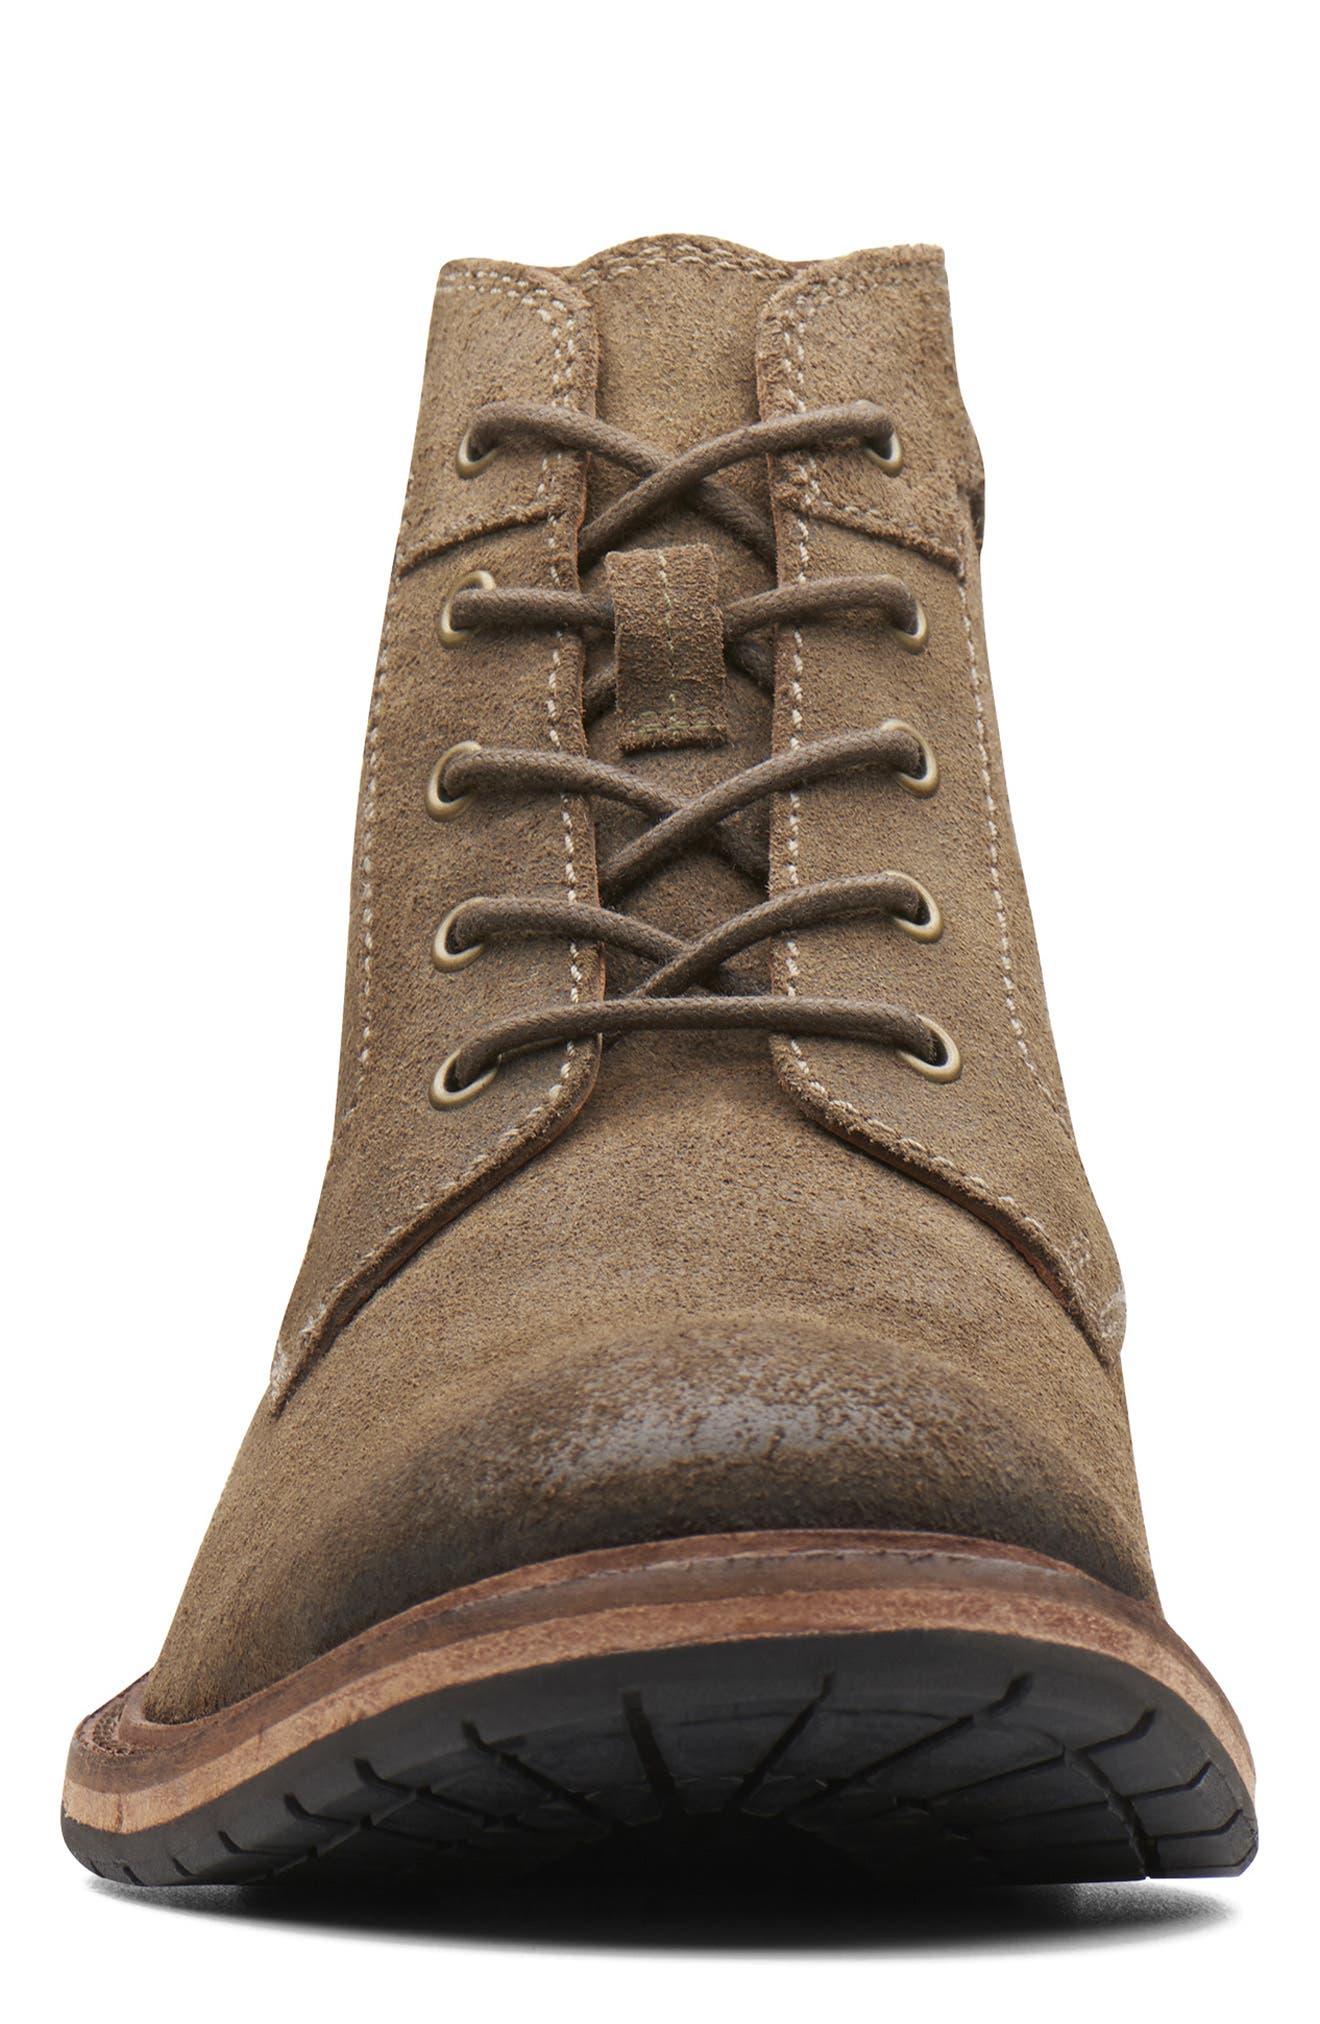 Clarkdale Bud Plain Toe Boot,                             Alternate thumbnail 3, color,                             KHAKI SUEDE